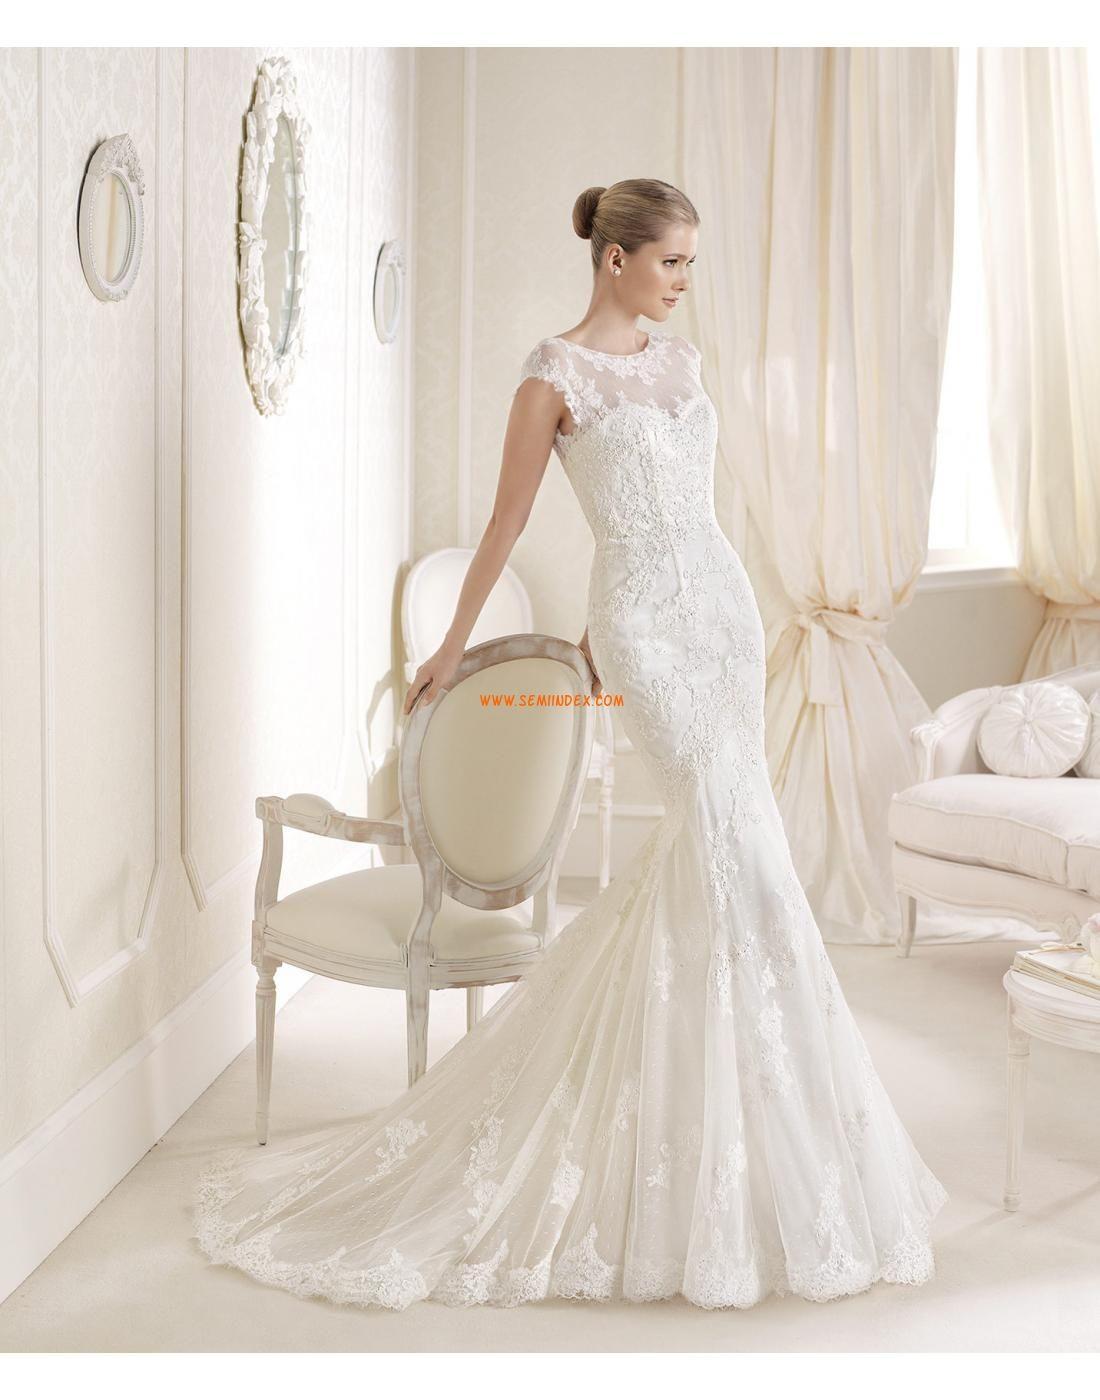 c2043366c704 Spets Elegant & Lyxig Kort ärm Lyx Bröllopsklänningar